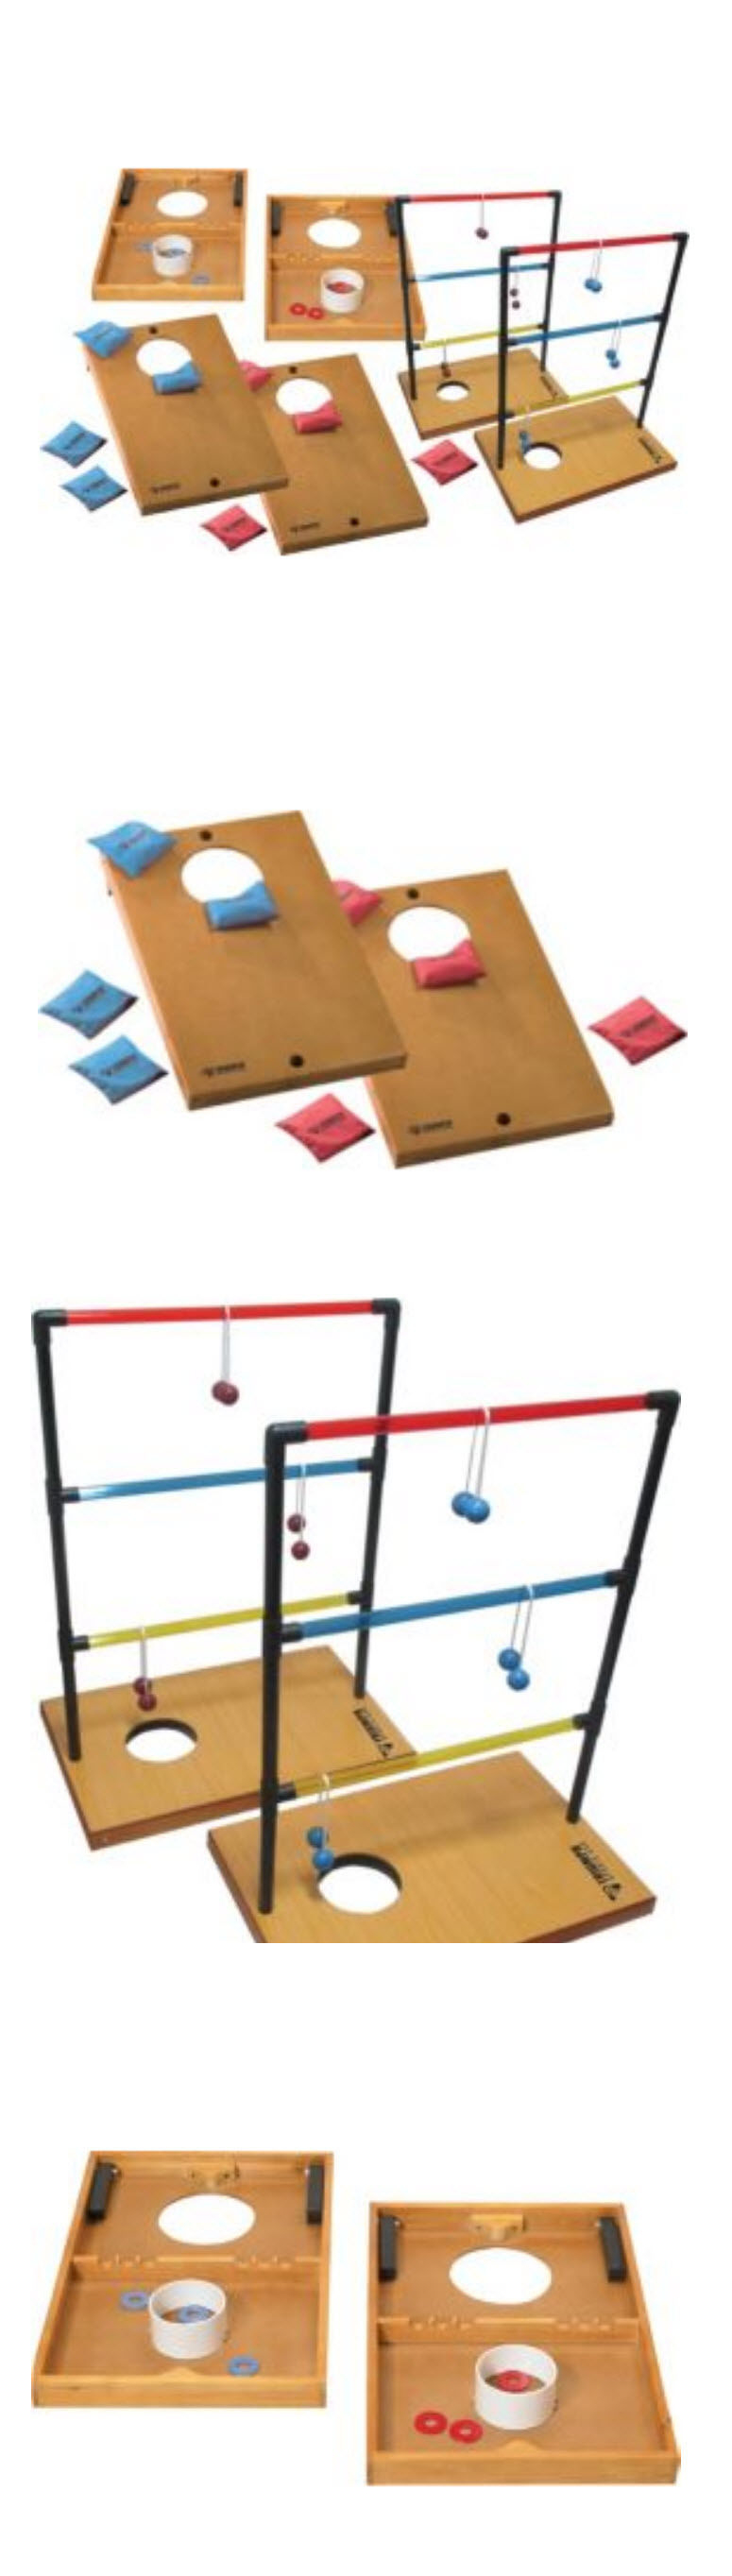 other backyard games 159081 backyard board games set triumph trio